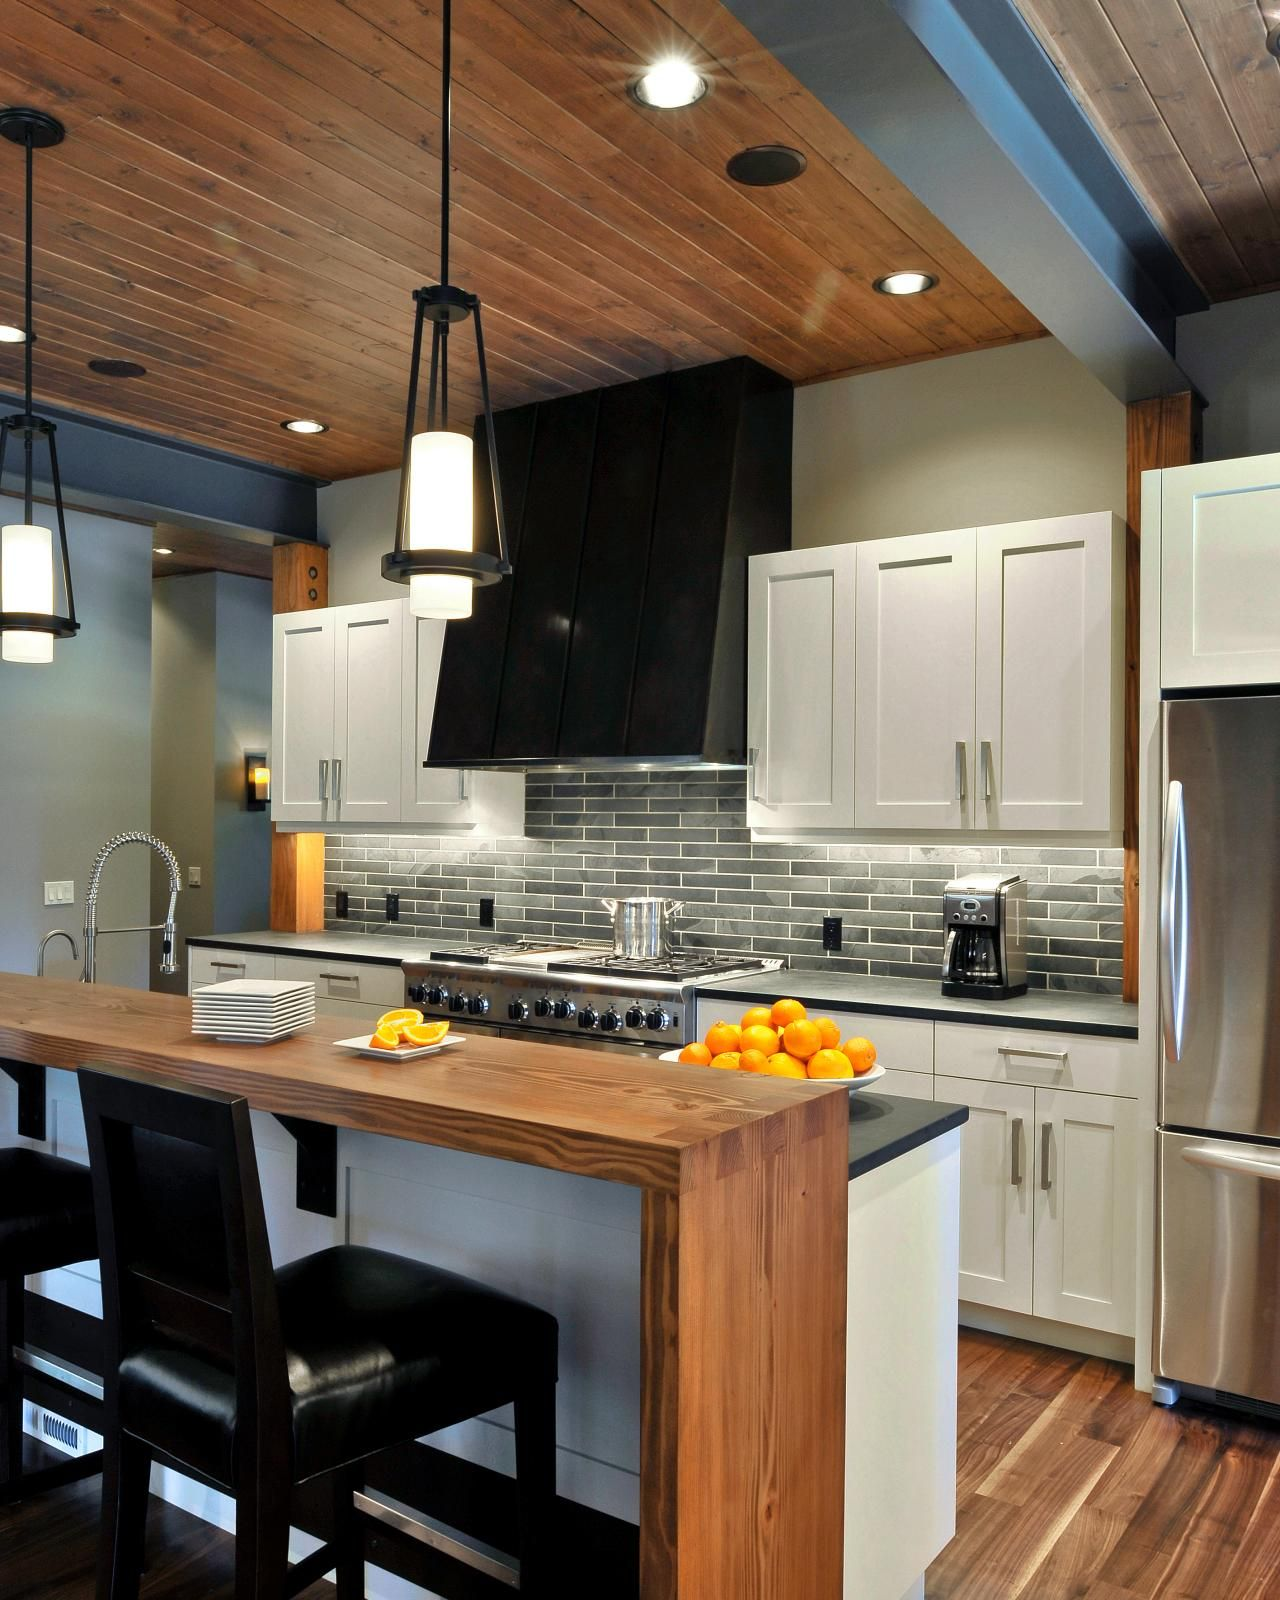 Black barstools countertops and a range hood create contrast